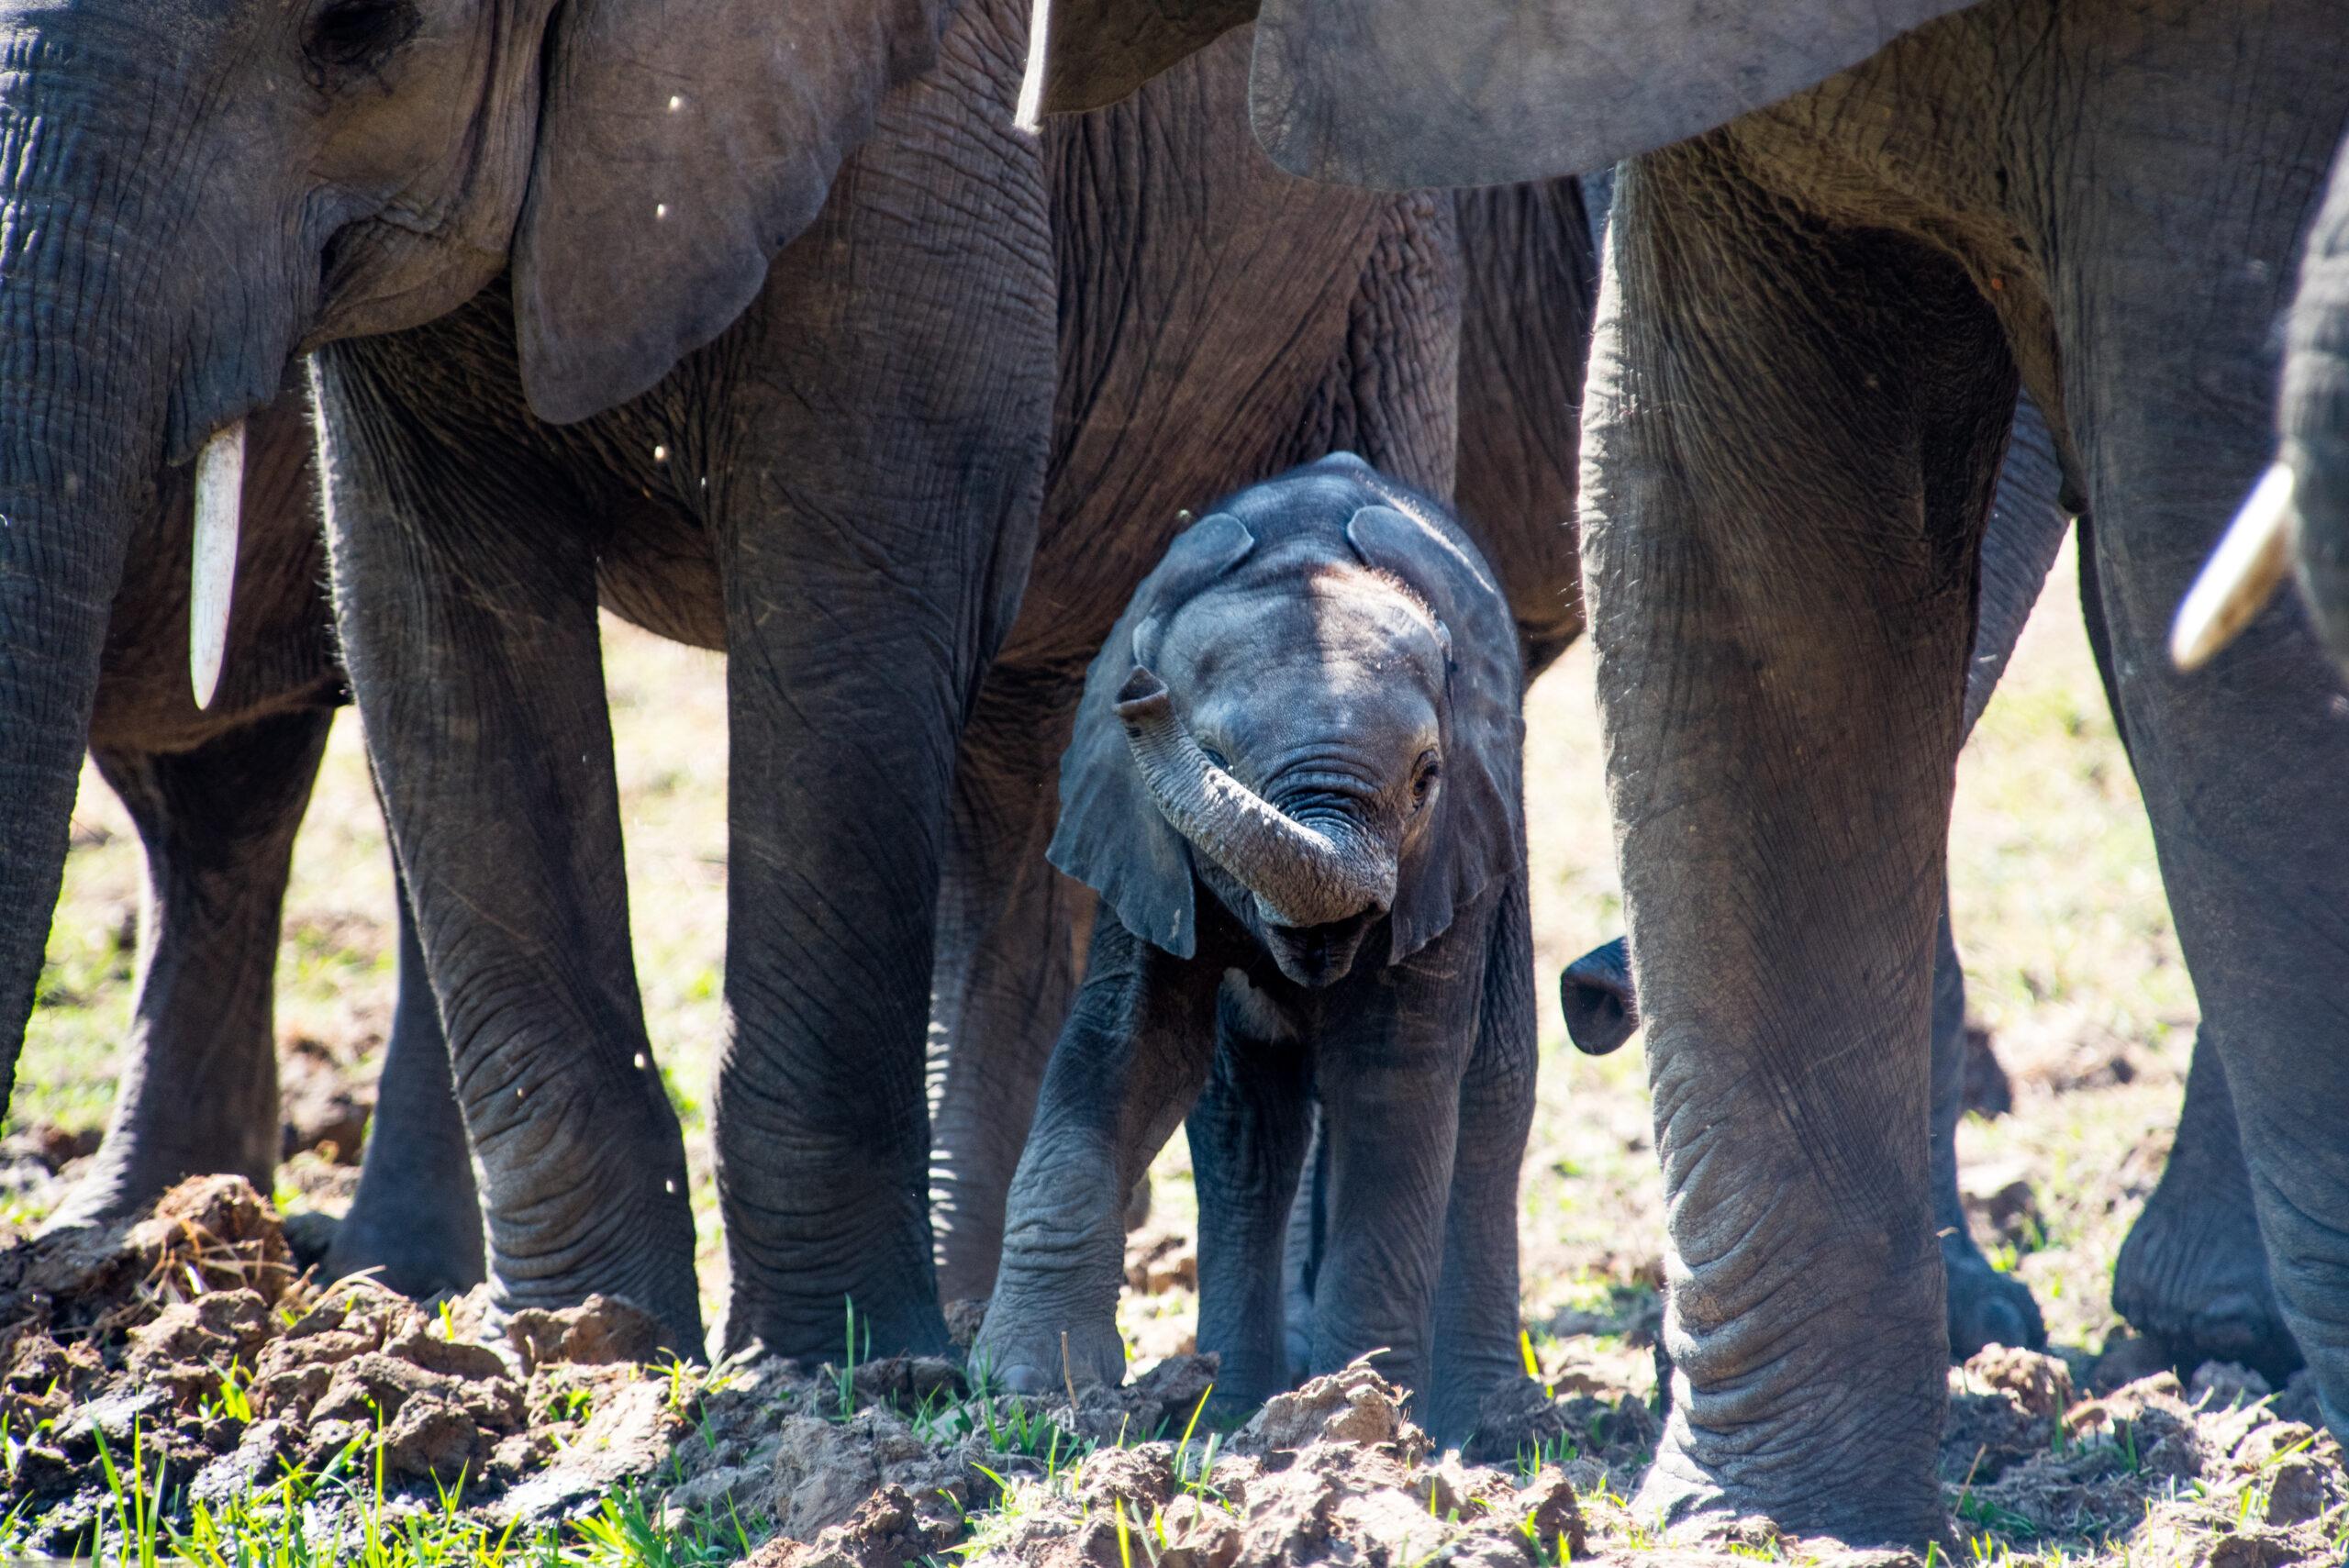 Baby Elephant with their herd Botwana